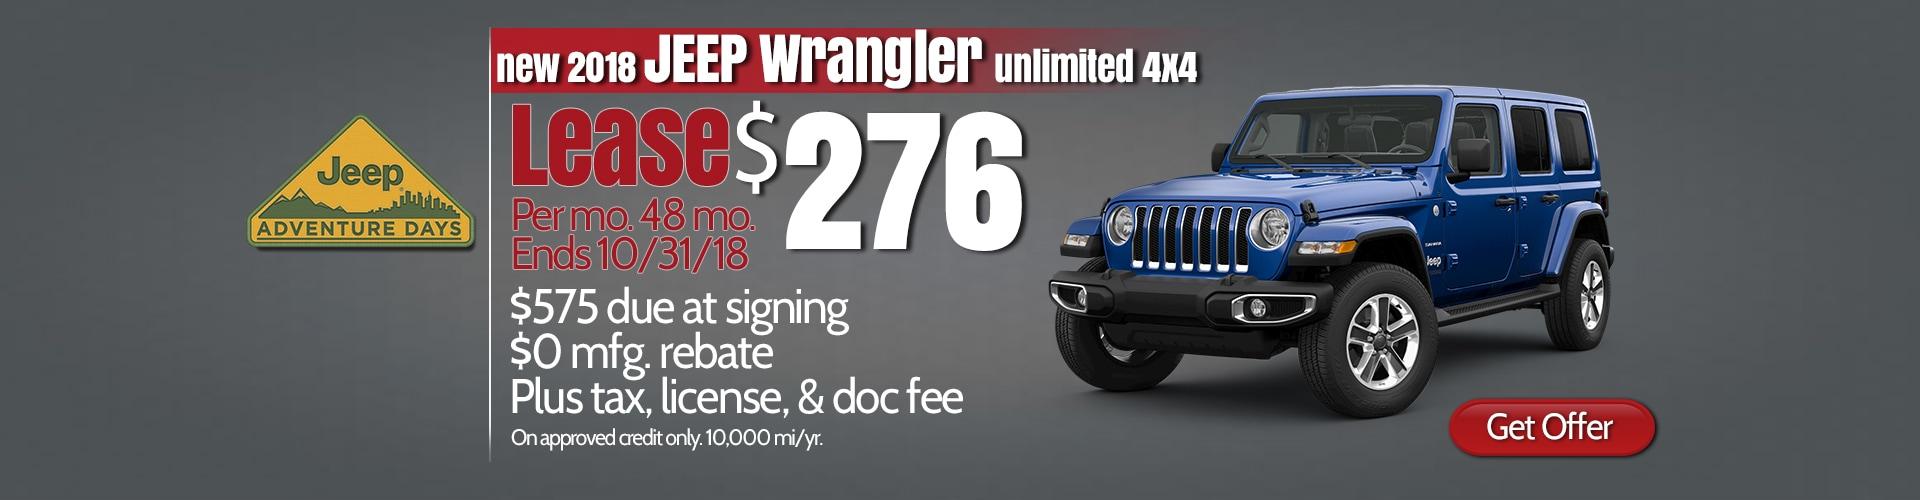 Jeff Wyler Eastgate Chrysler Jeep Dodge RAM | New And Used Chrysler, Jeep,  Dodge And RAM Dealer Cincinnati Ohio